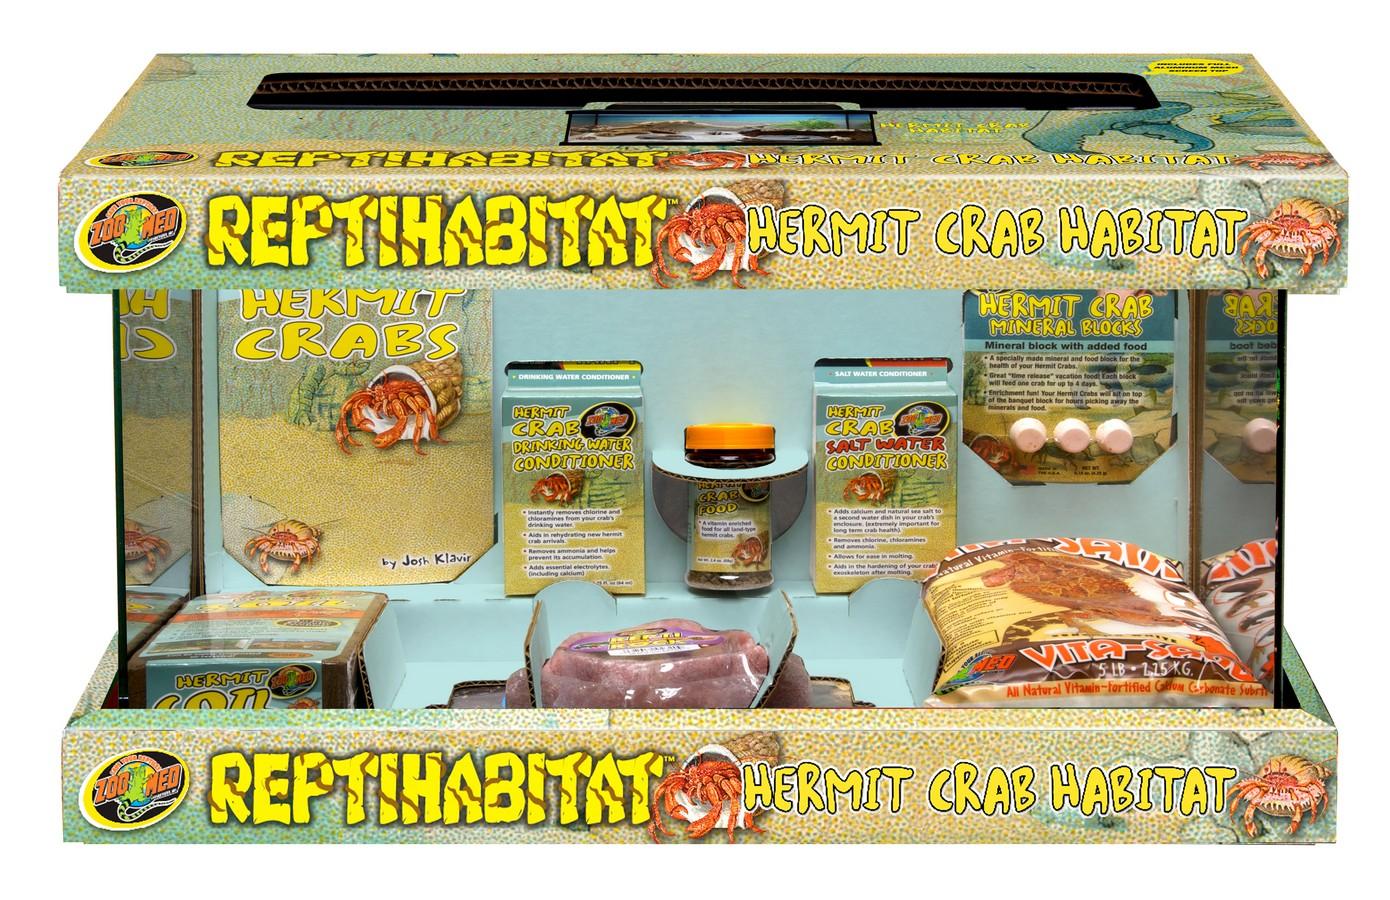 10 gallon reptihabitat hermit crab kit zoo med